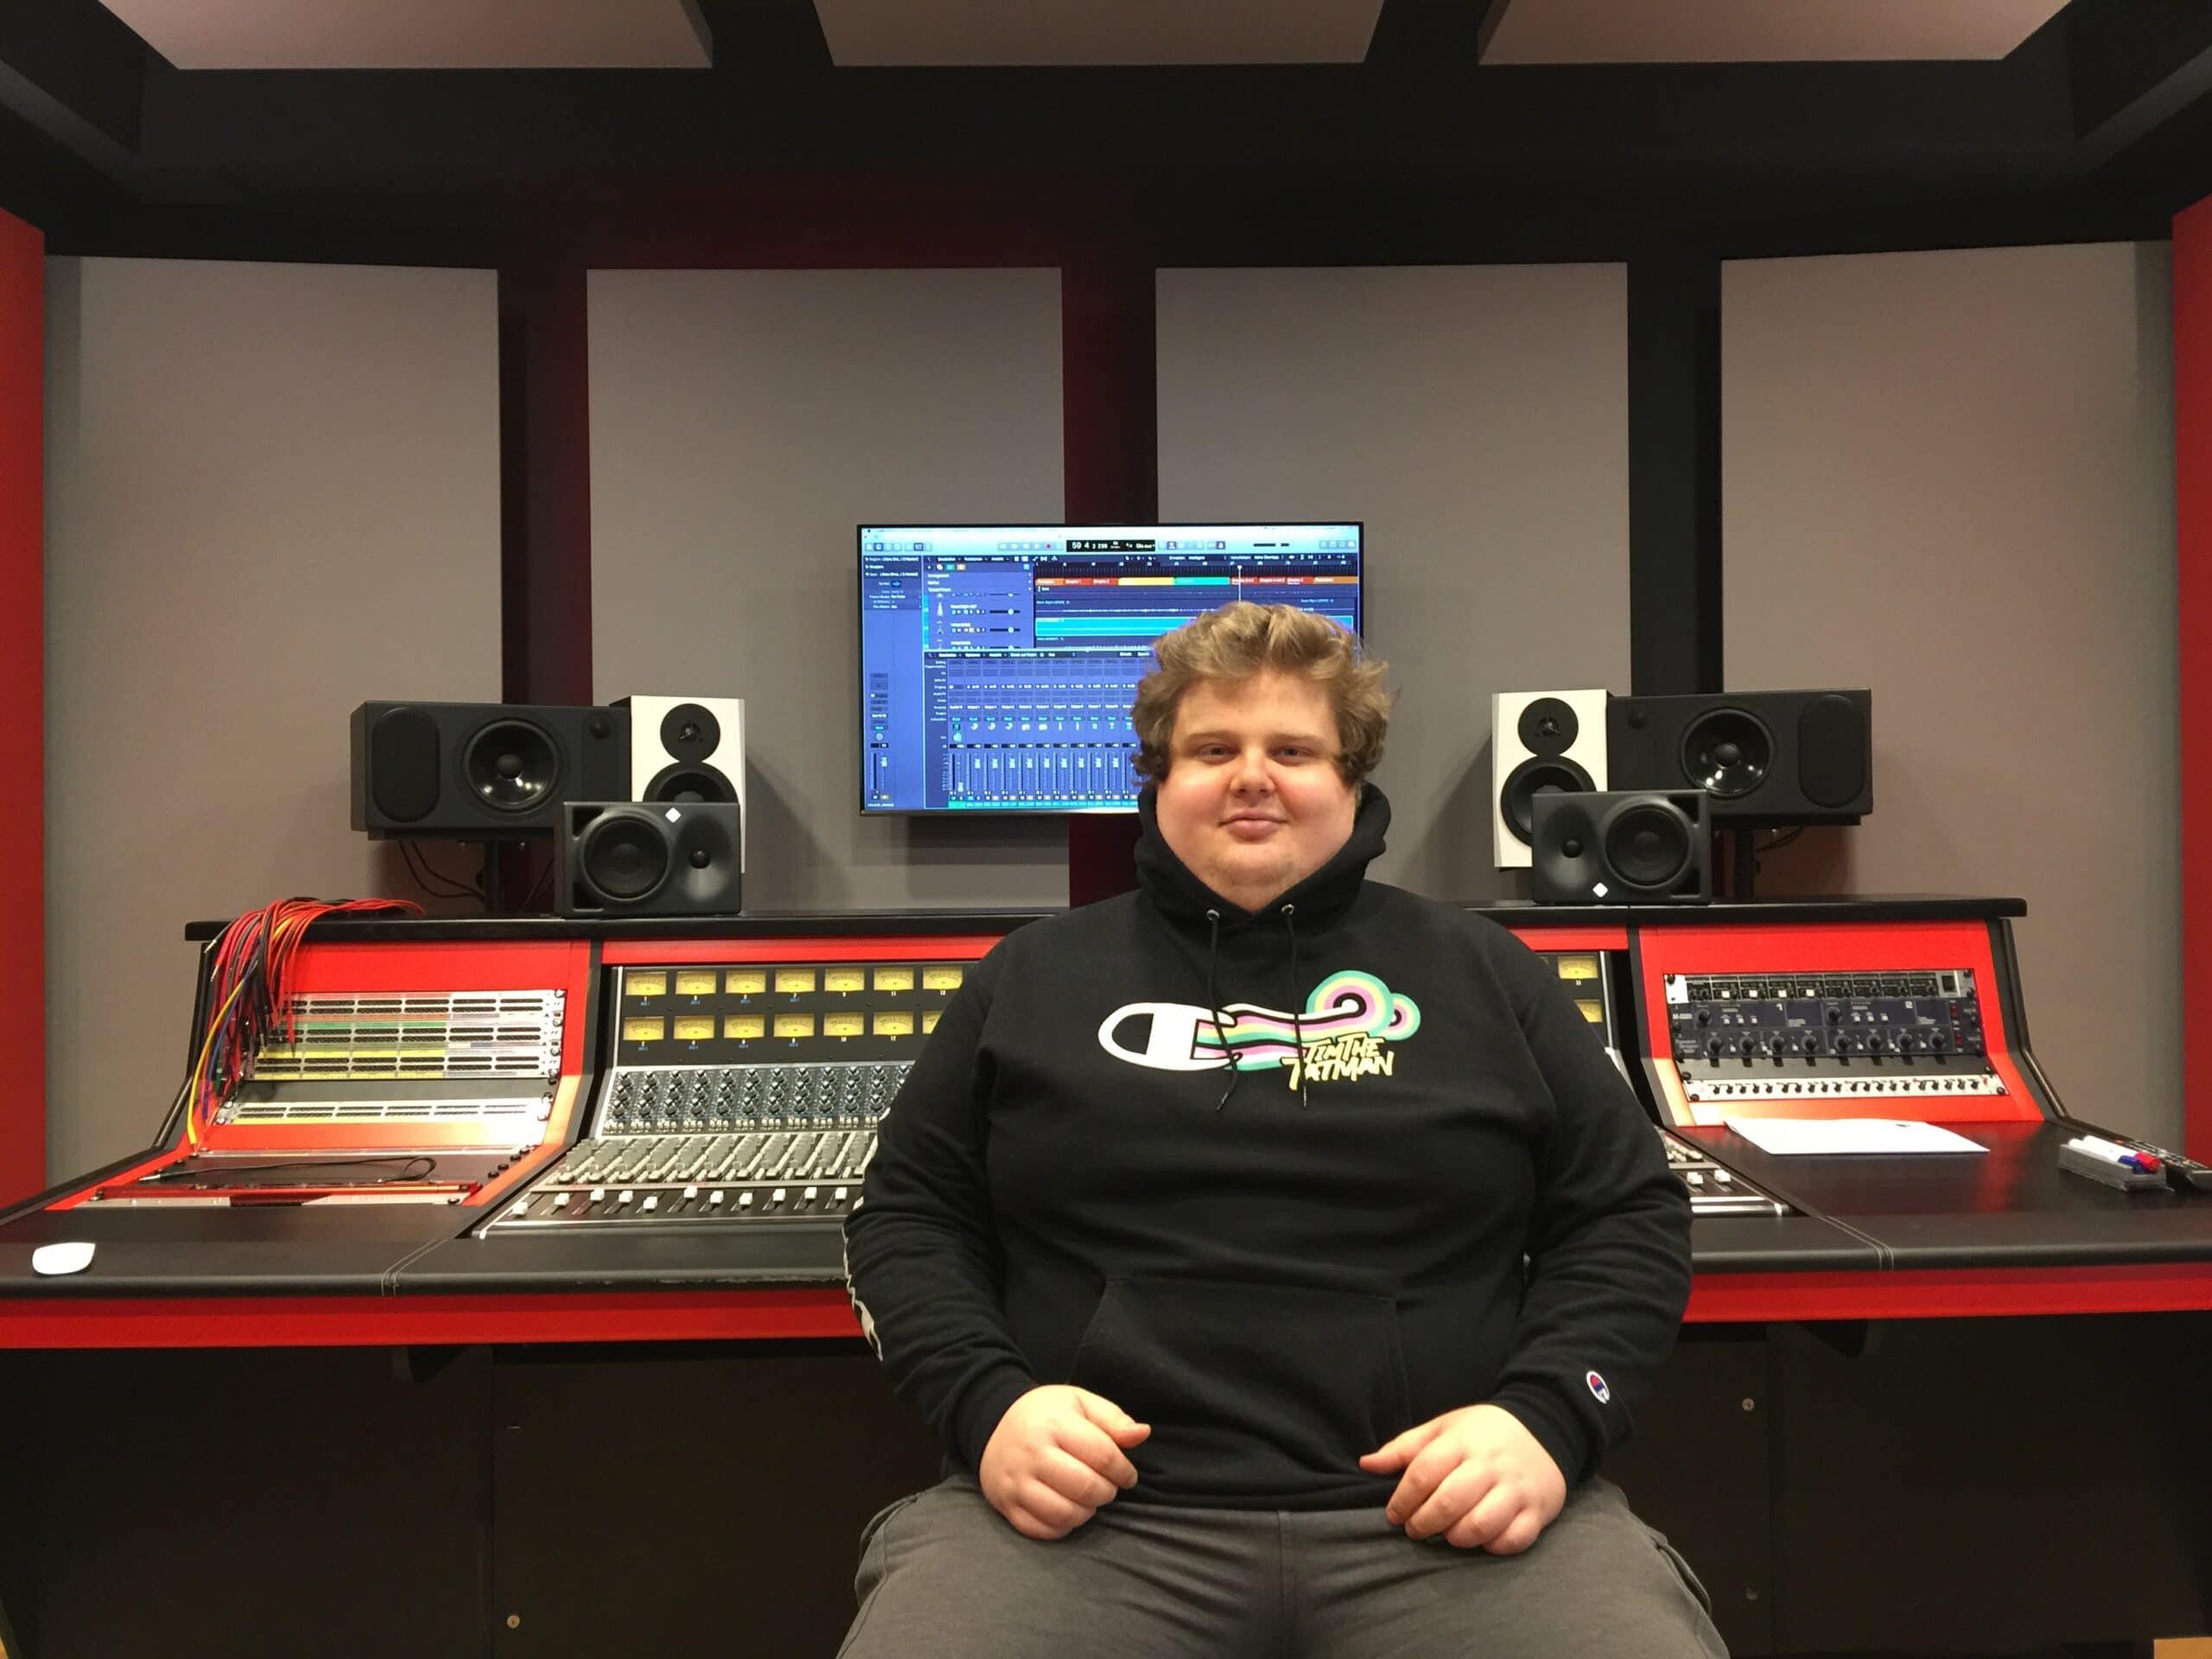 Leo im Studio 2 an der API Konsole